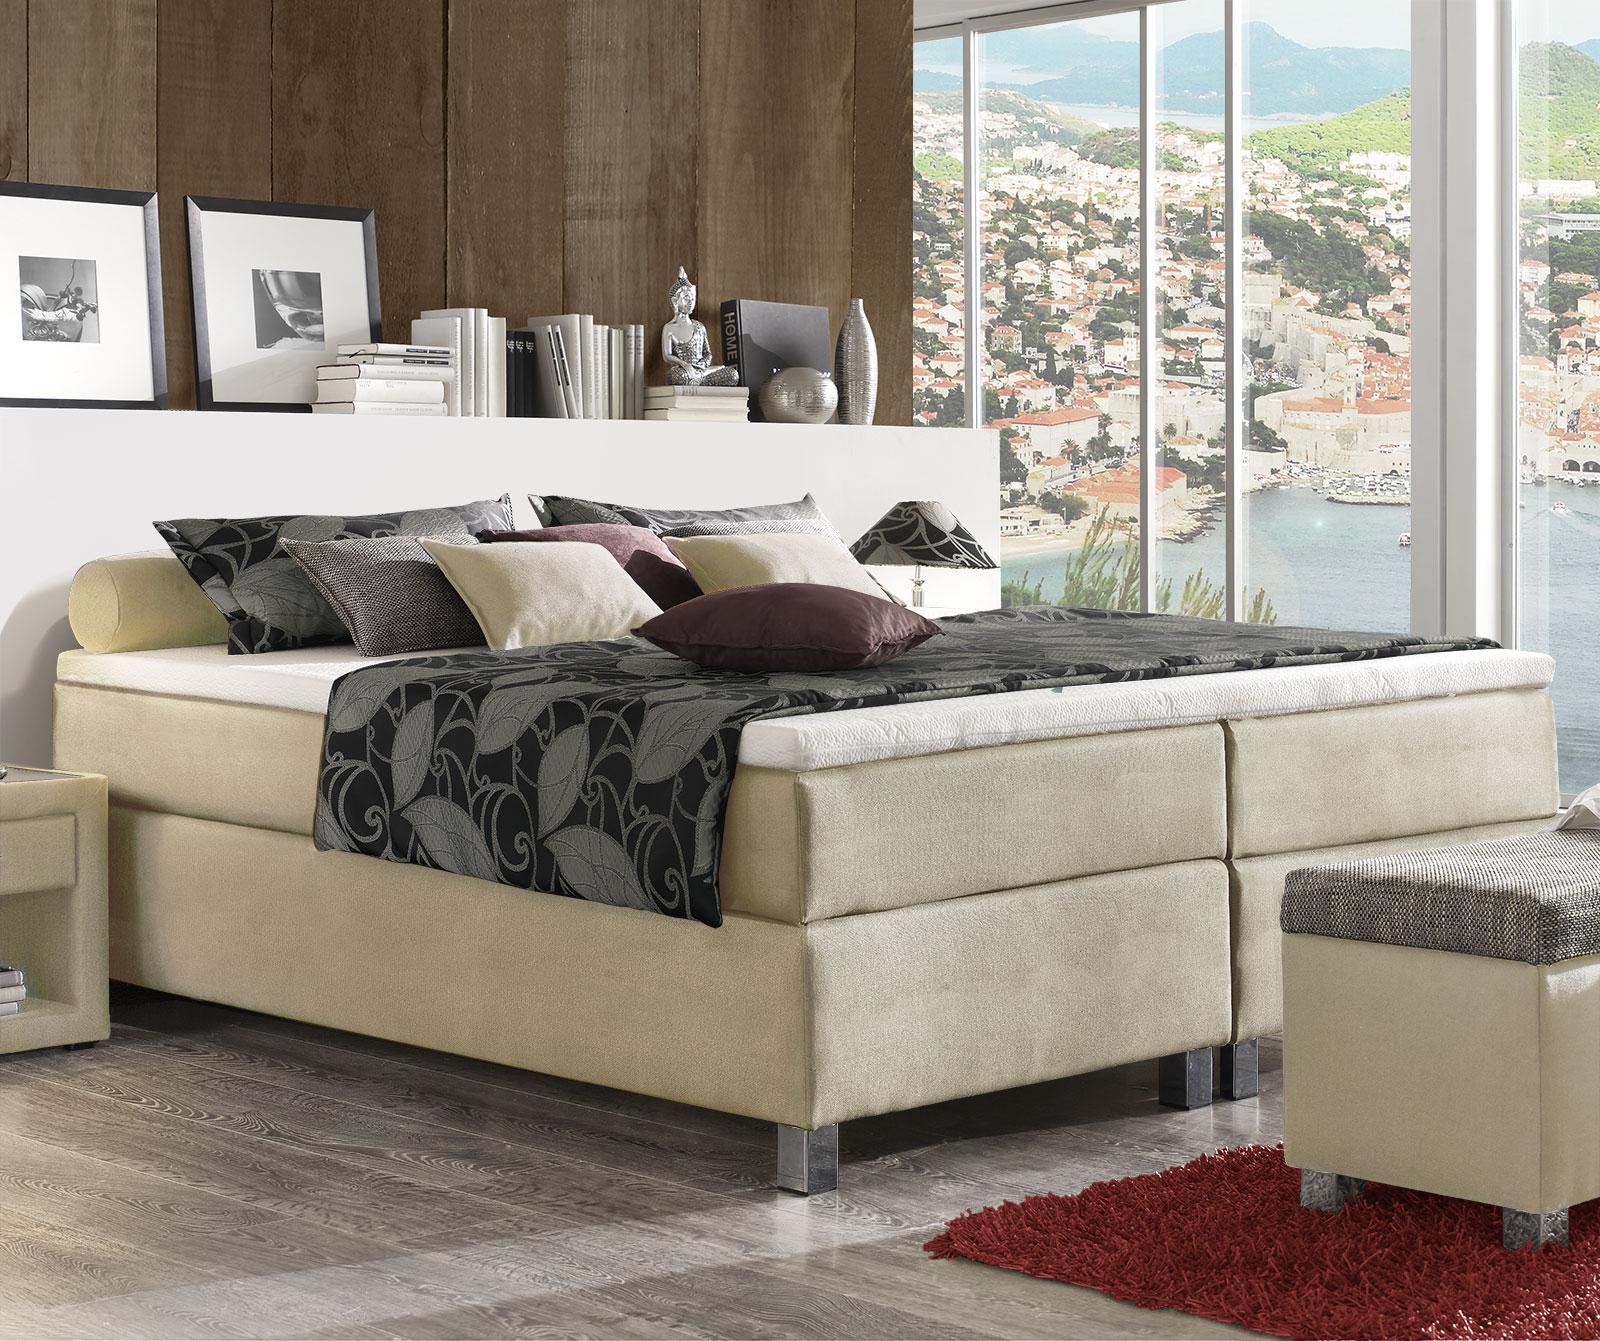 boxspringbett ohne metall neuesten design kollektionen f r die familien. Black Bedroom Furniture Sets. Home Design Ideas